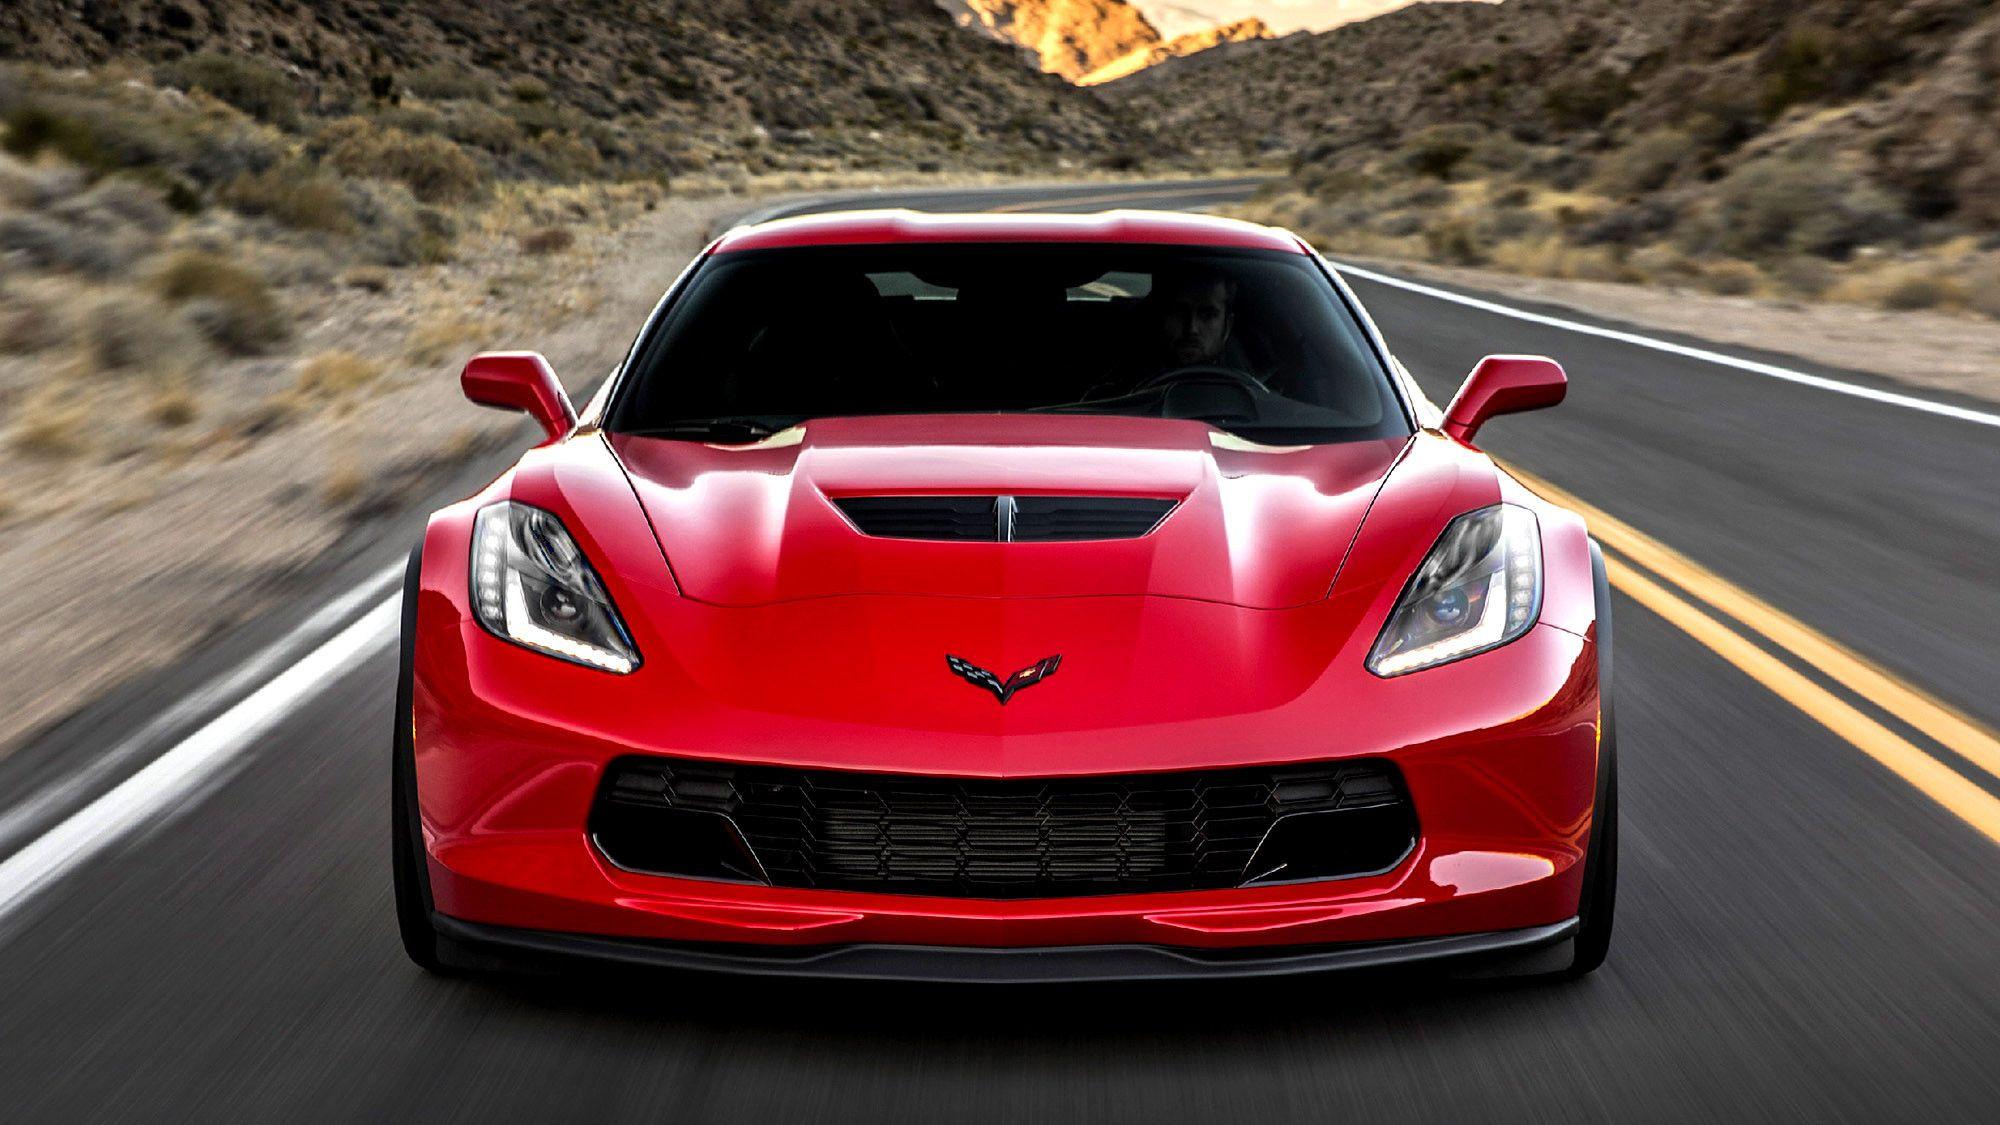 Corvette z06 power perks and an intoxicating roar